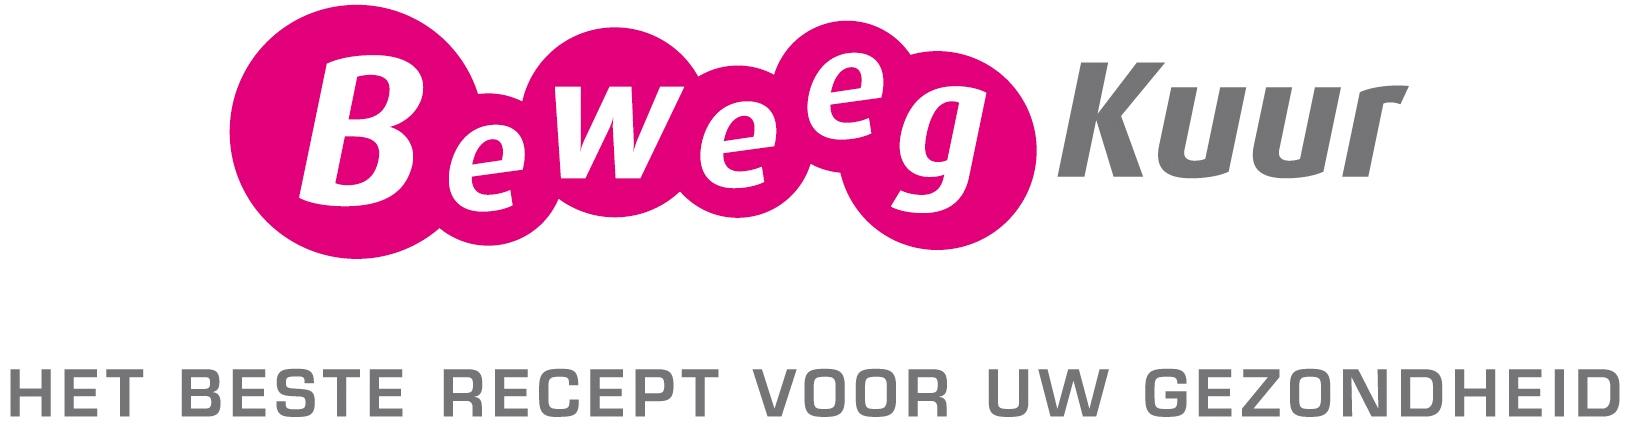 Logo beweegkuur